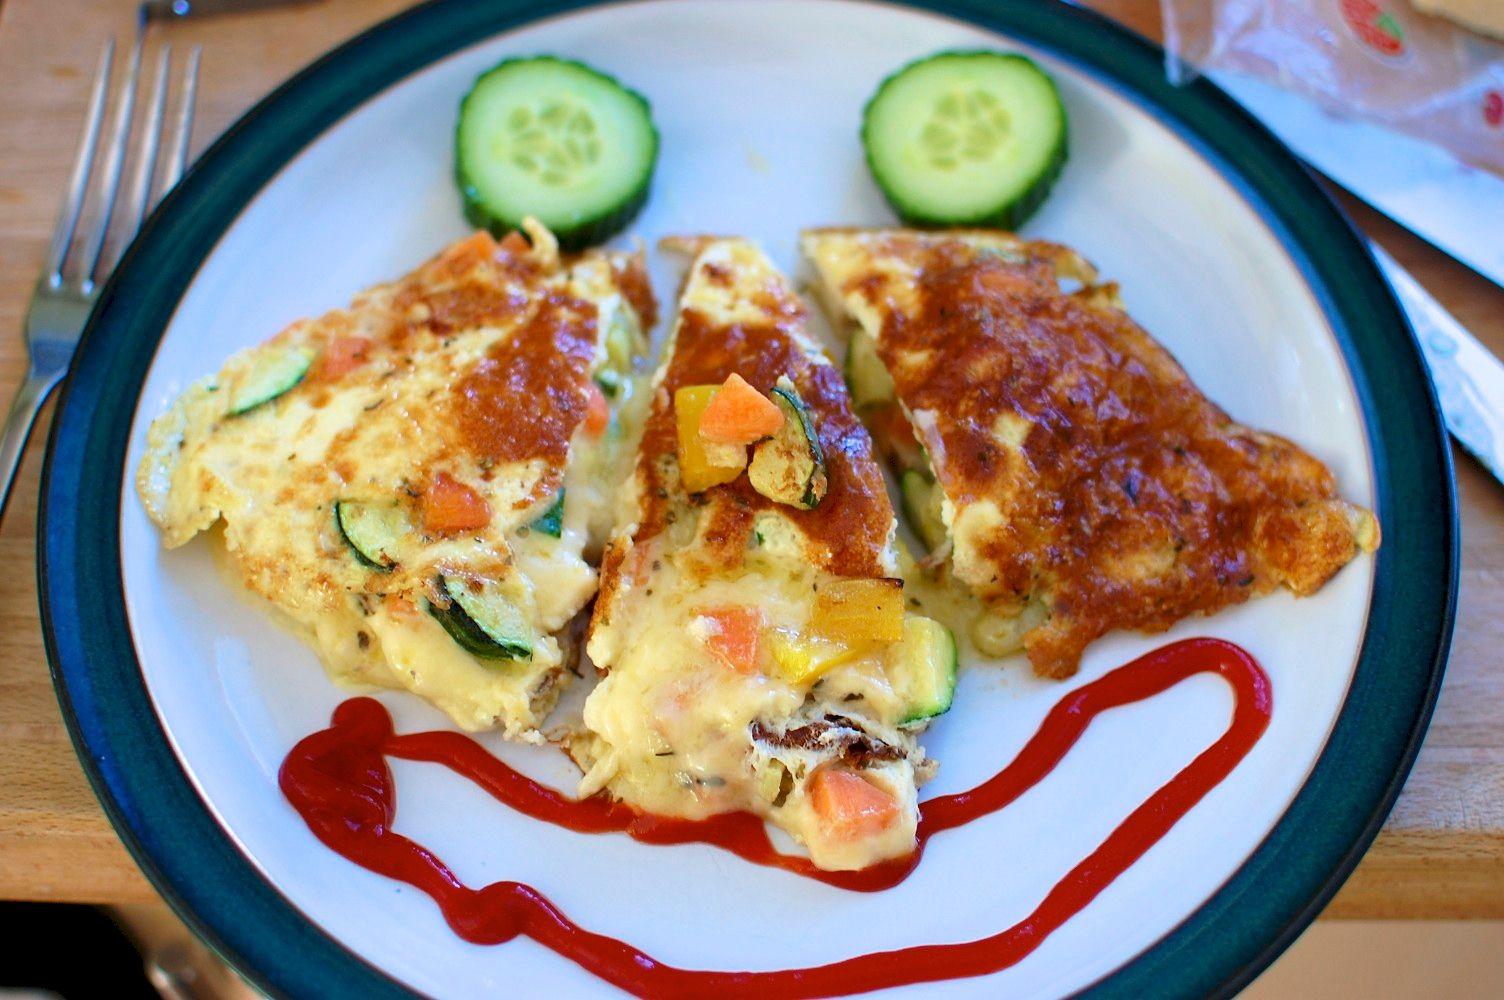 omelette-food-face 4532626186 o